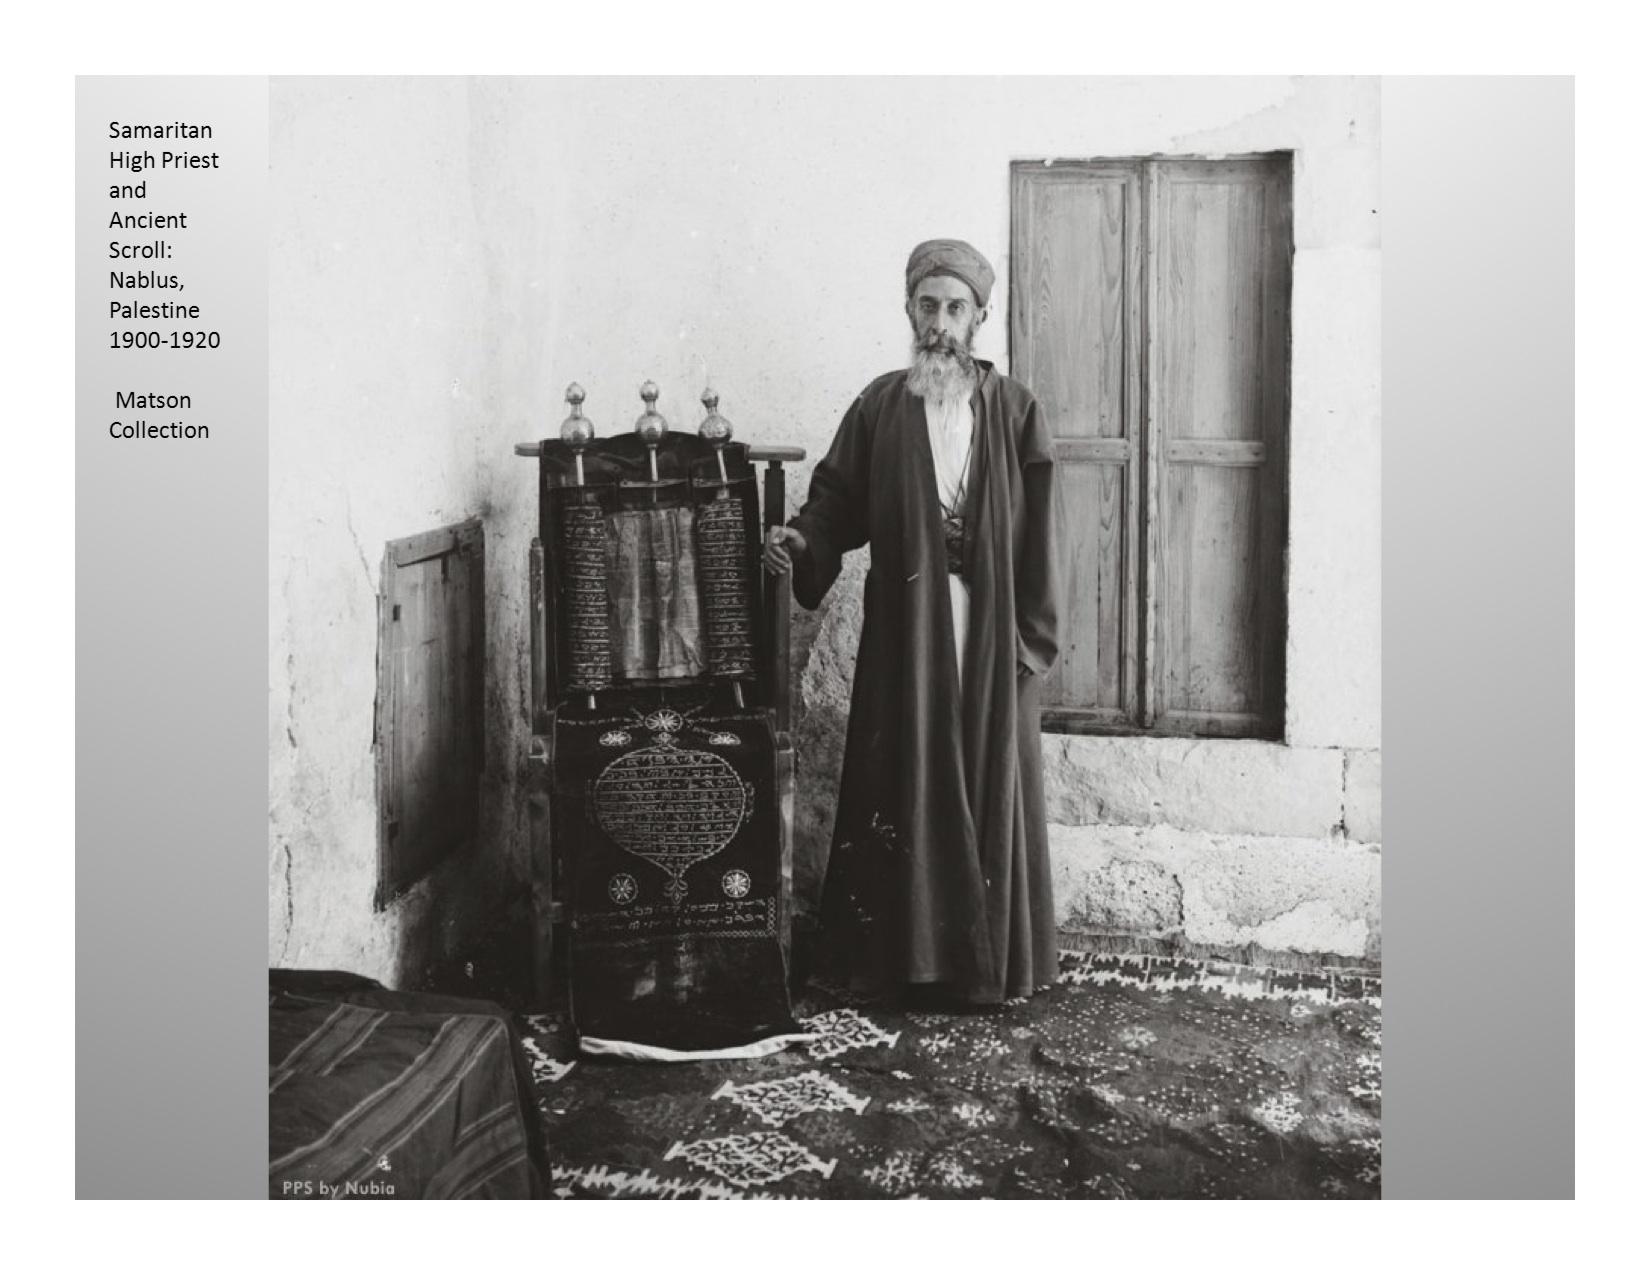 Samaritan High Priest and Scroll 1900s